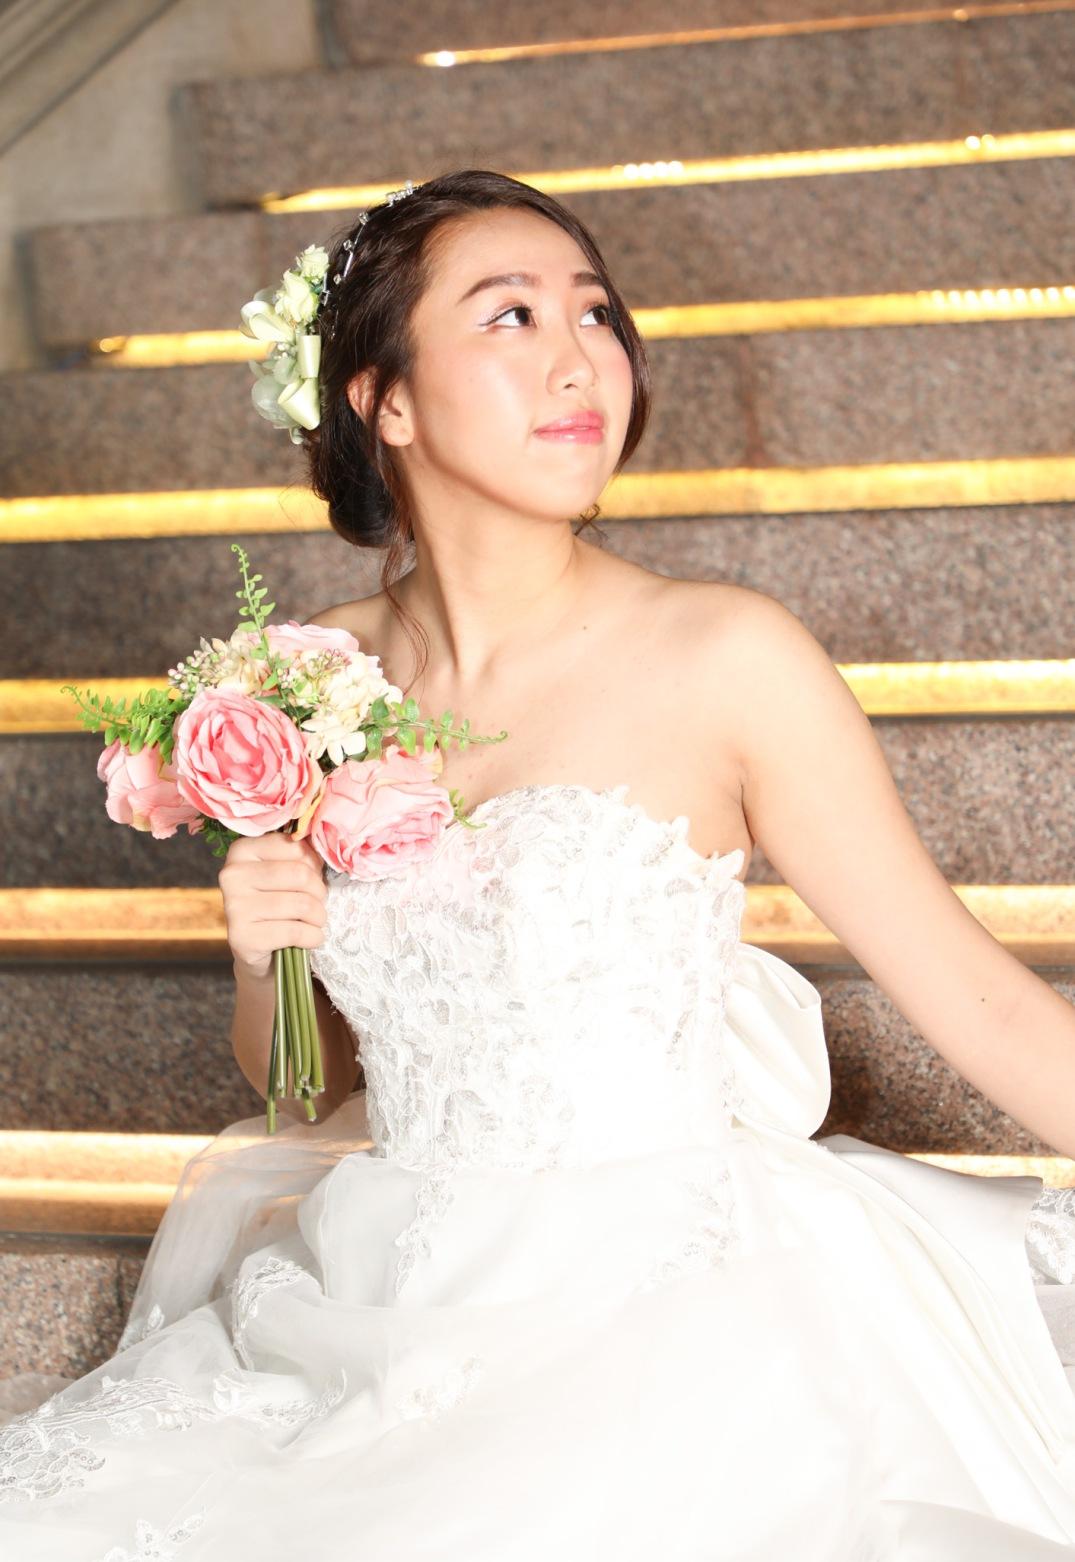 wedding big day photography hk 攝影價錢 香港婚禮攝影推薦 coolstylist-26